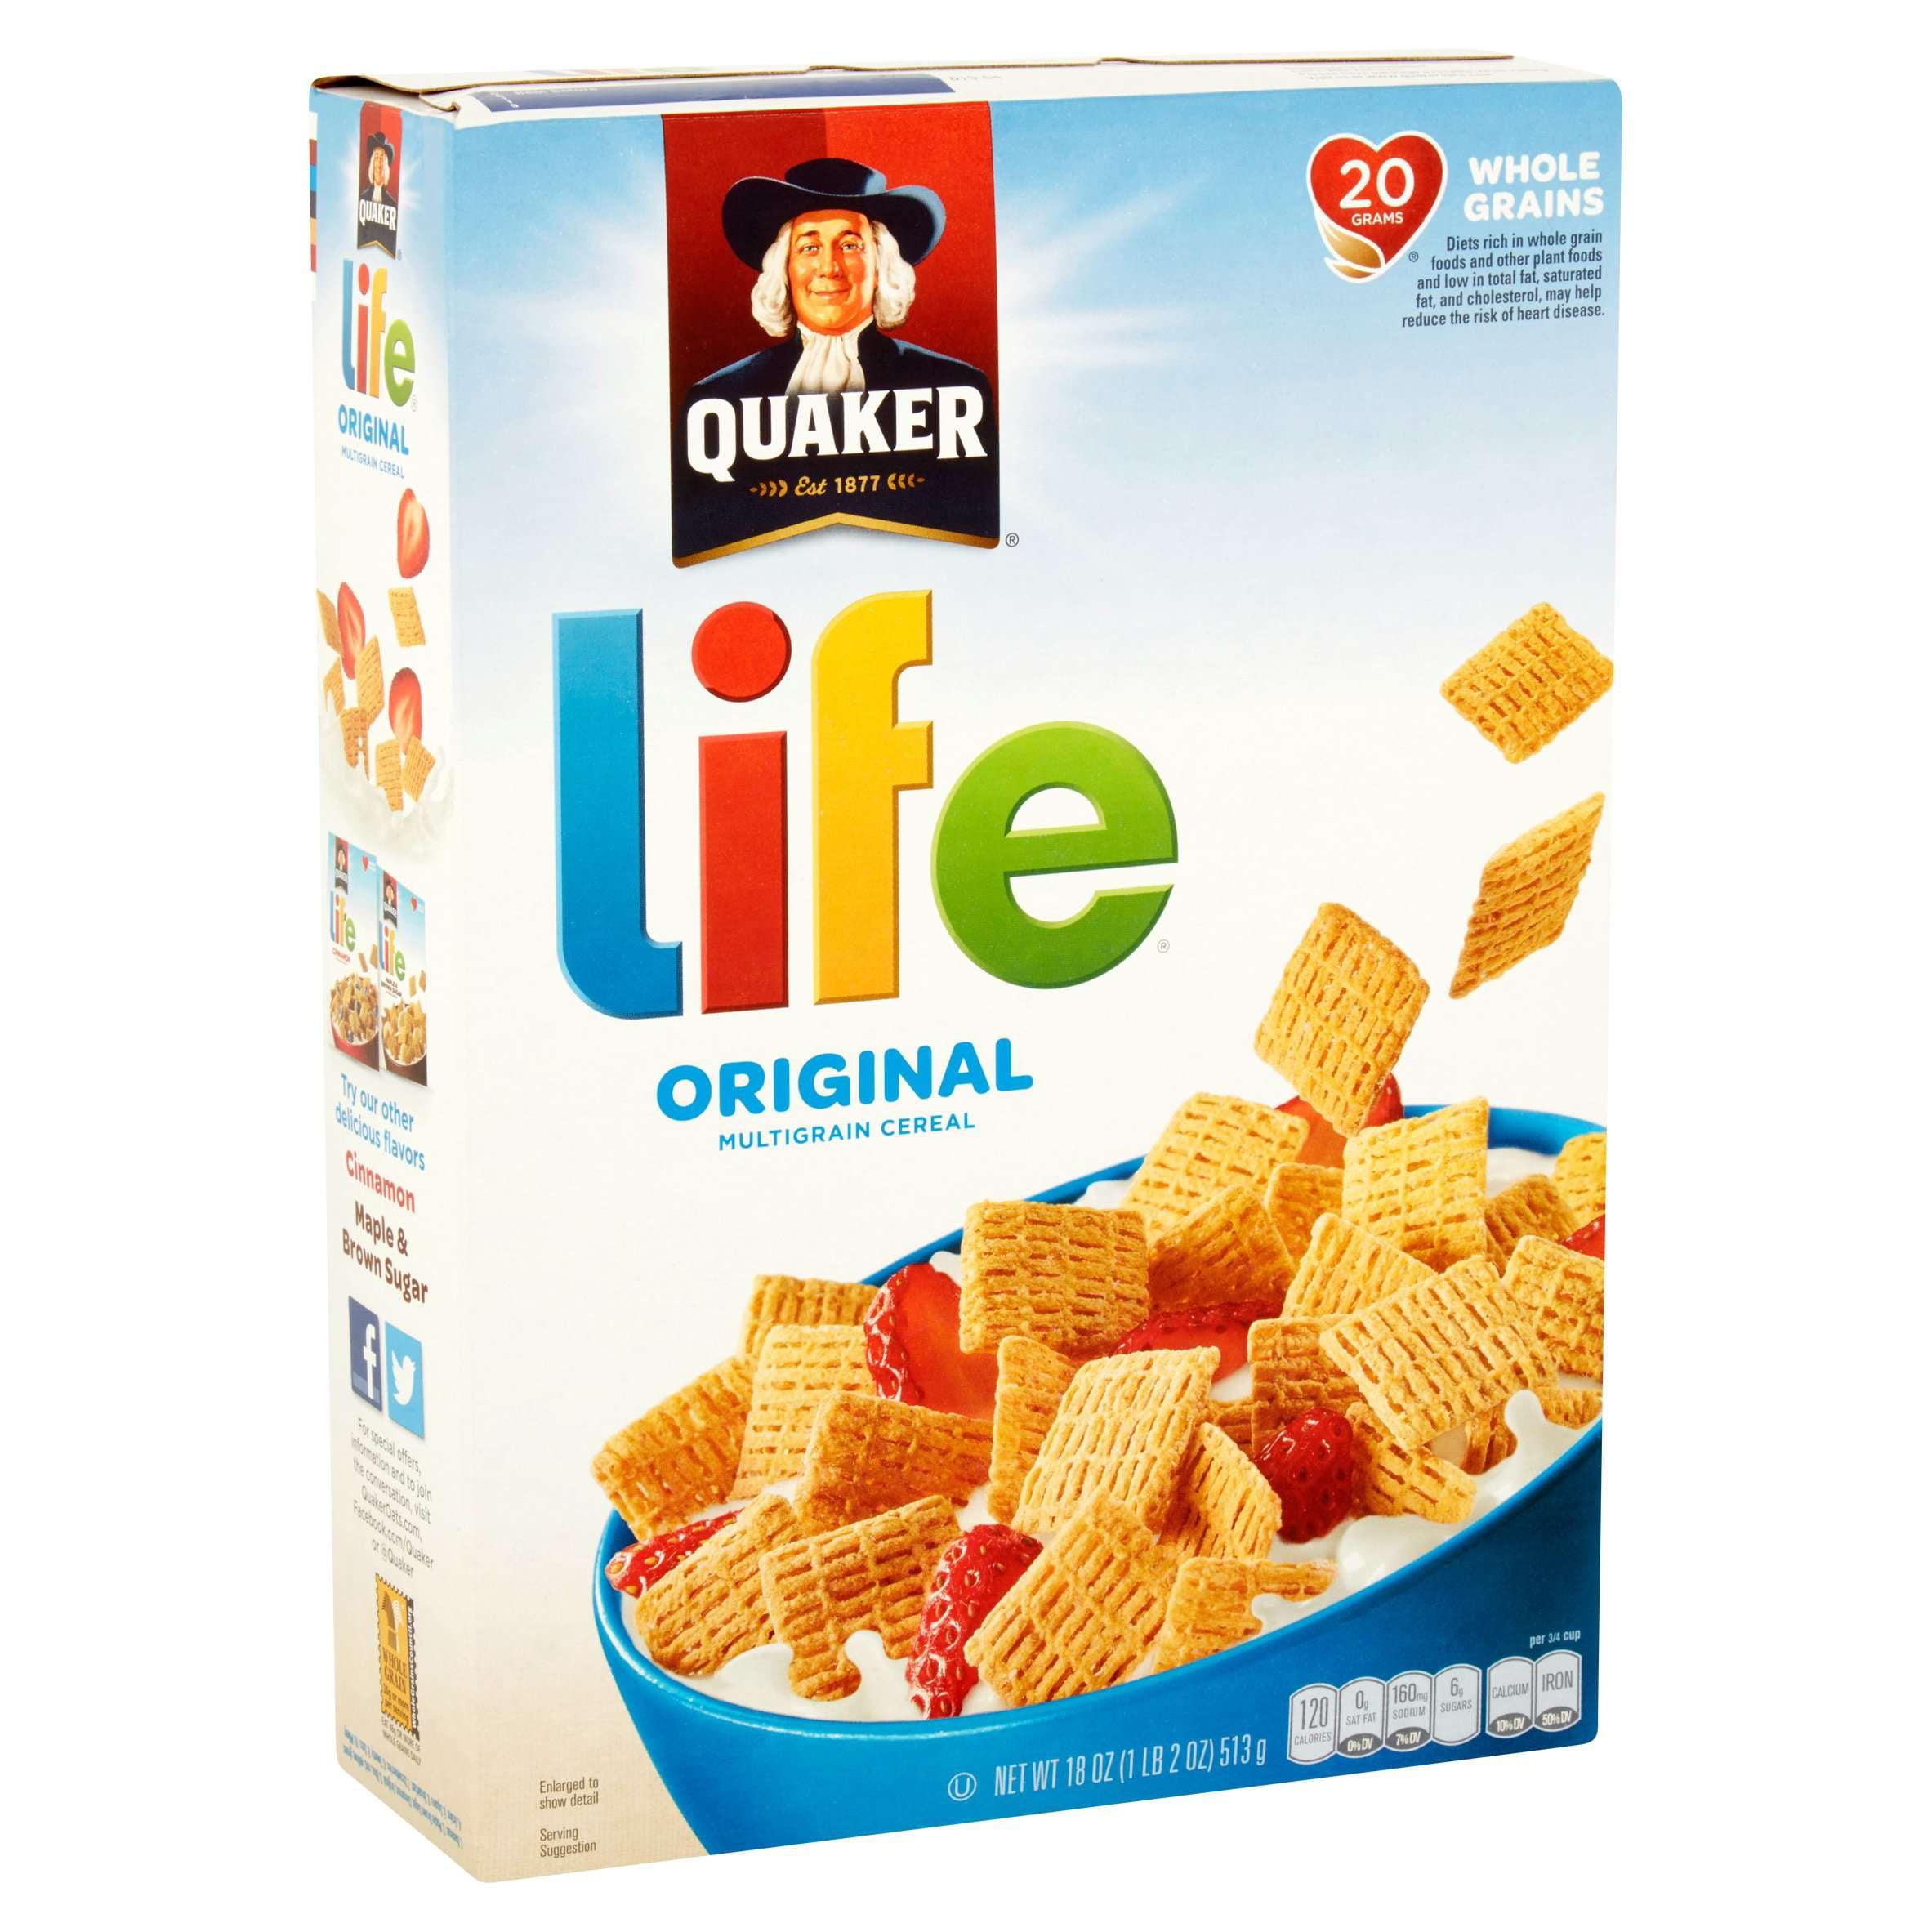 Quaker Life Multigrain Cereal, Original, 18 oz Box